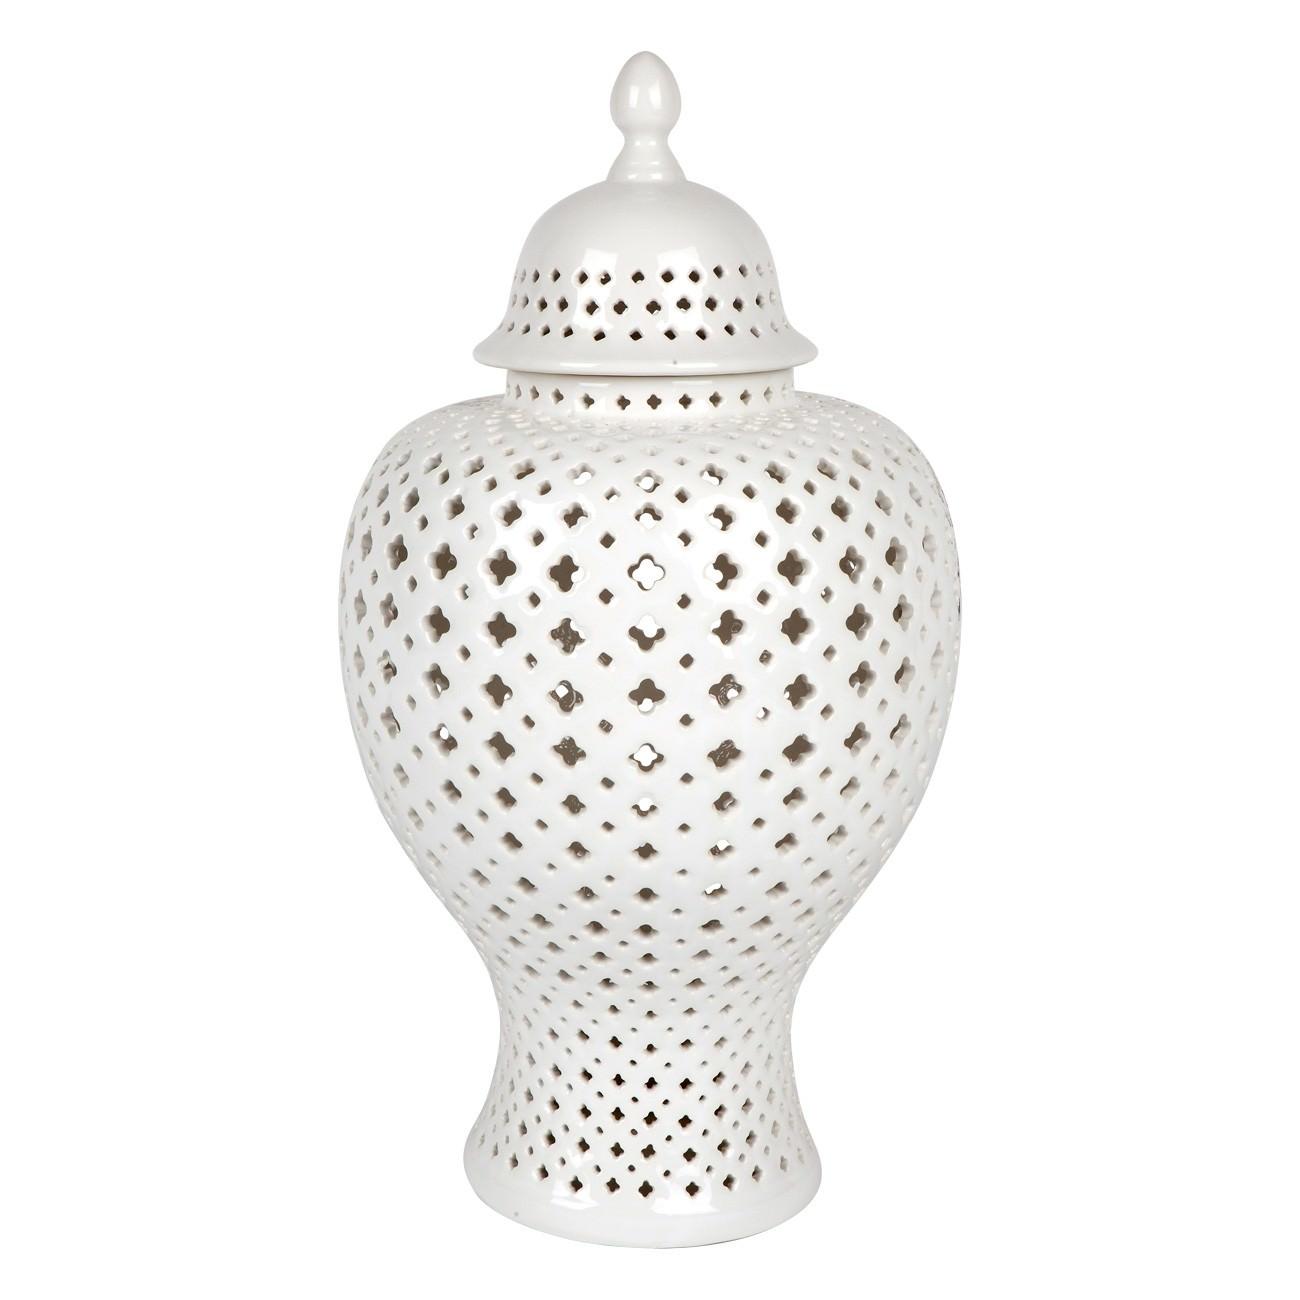 Minx Porcelain Temple Jar Large White Large Only